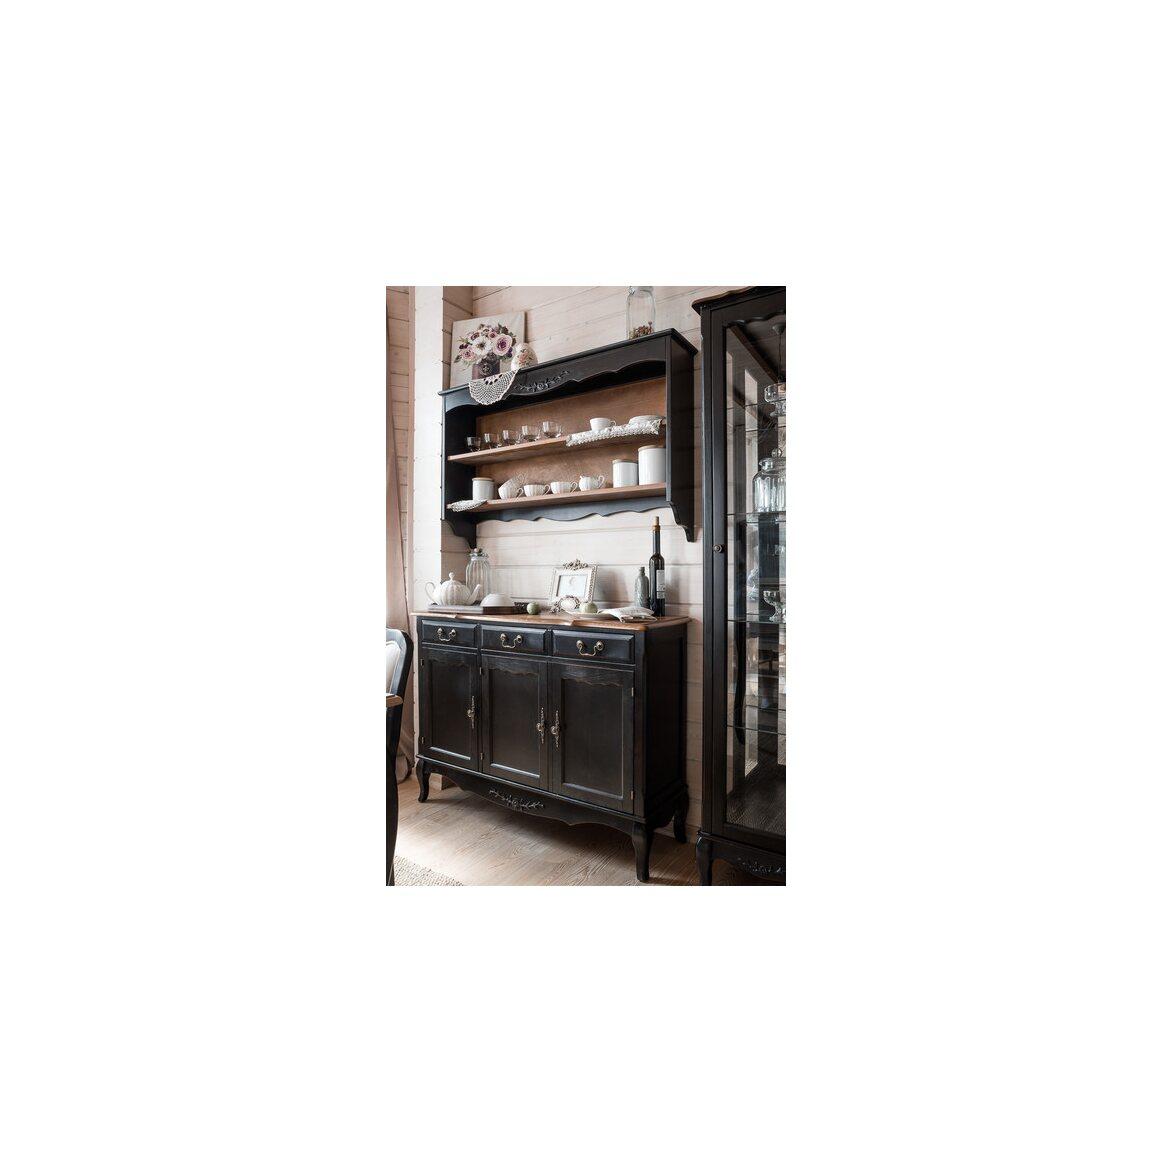 Буфет трехстворчатый с 3-я ящиками Leontina, черного цвета 3 | Буфеты Kingsby